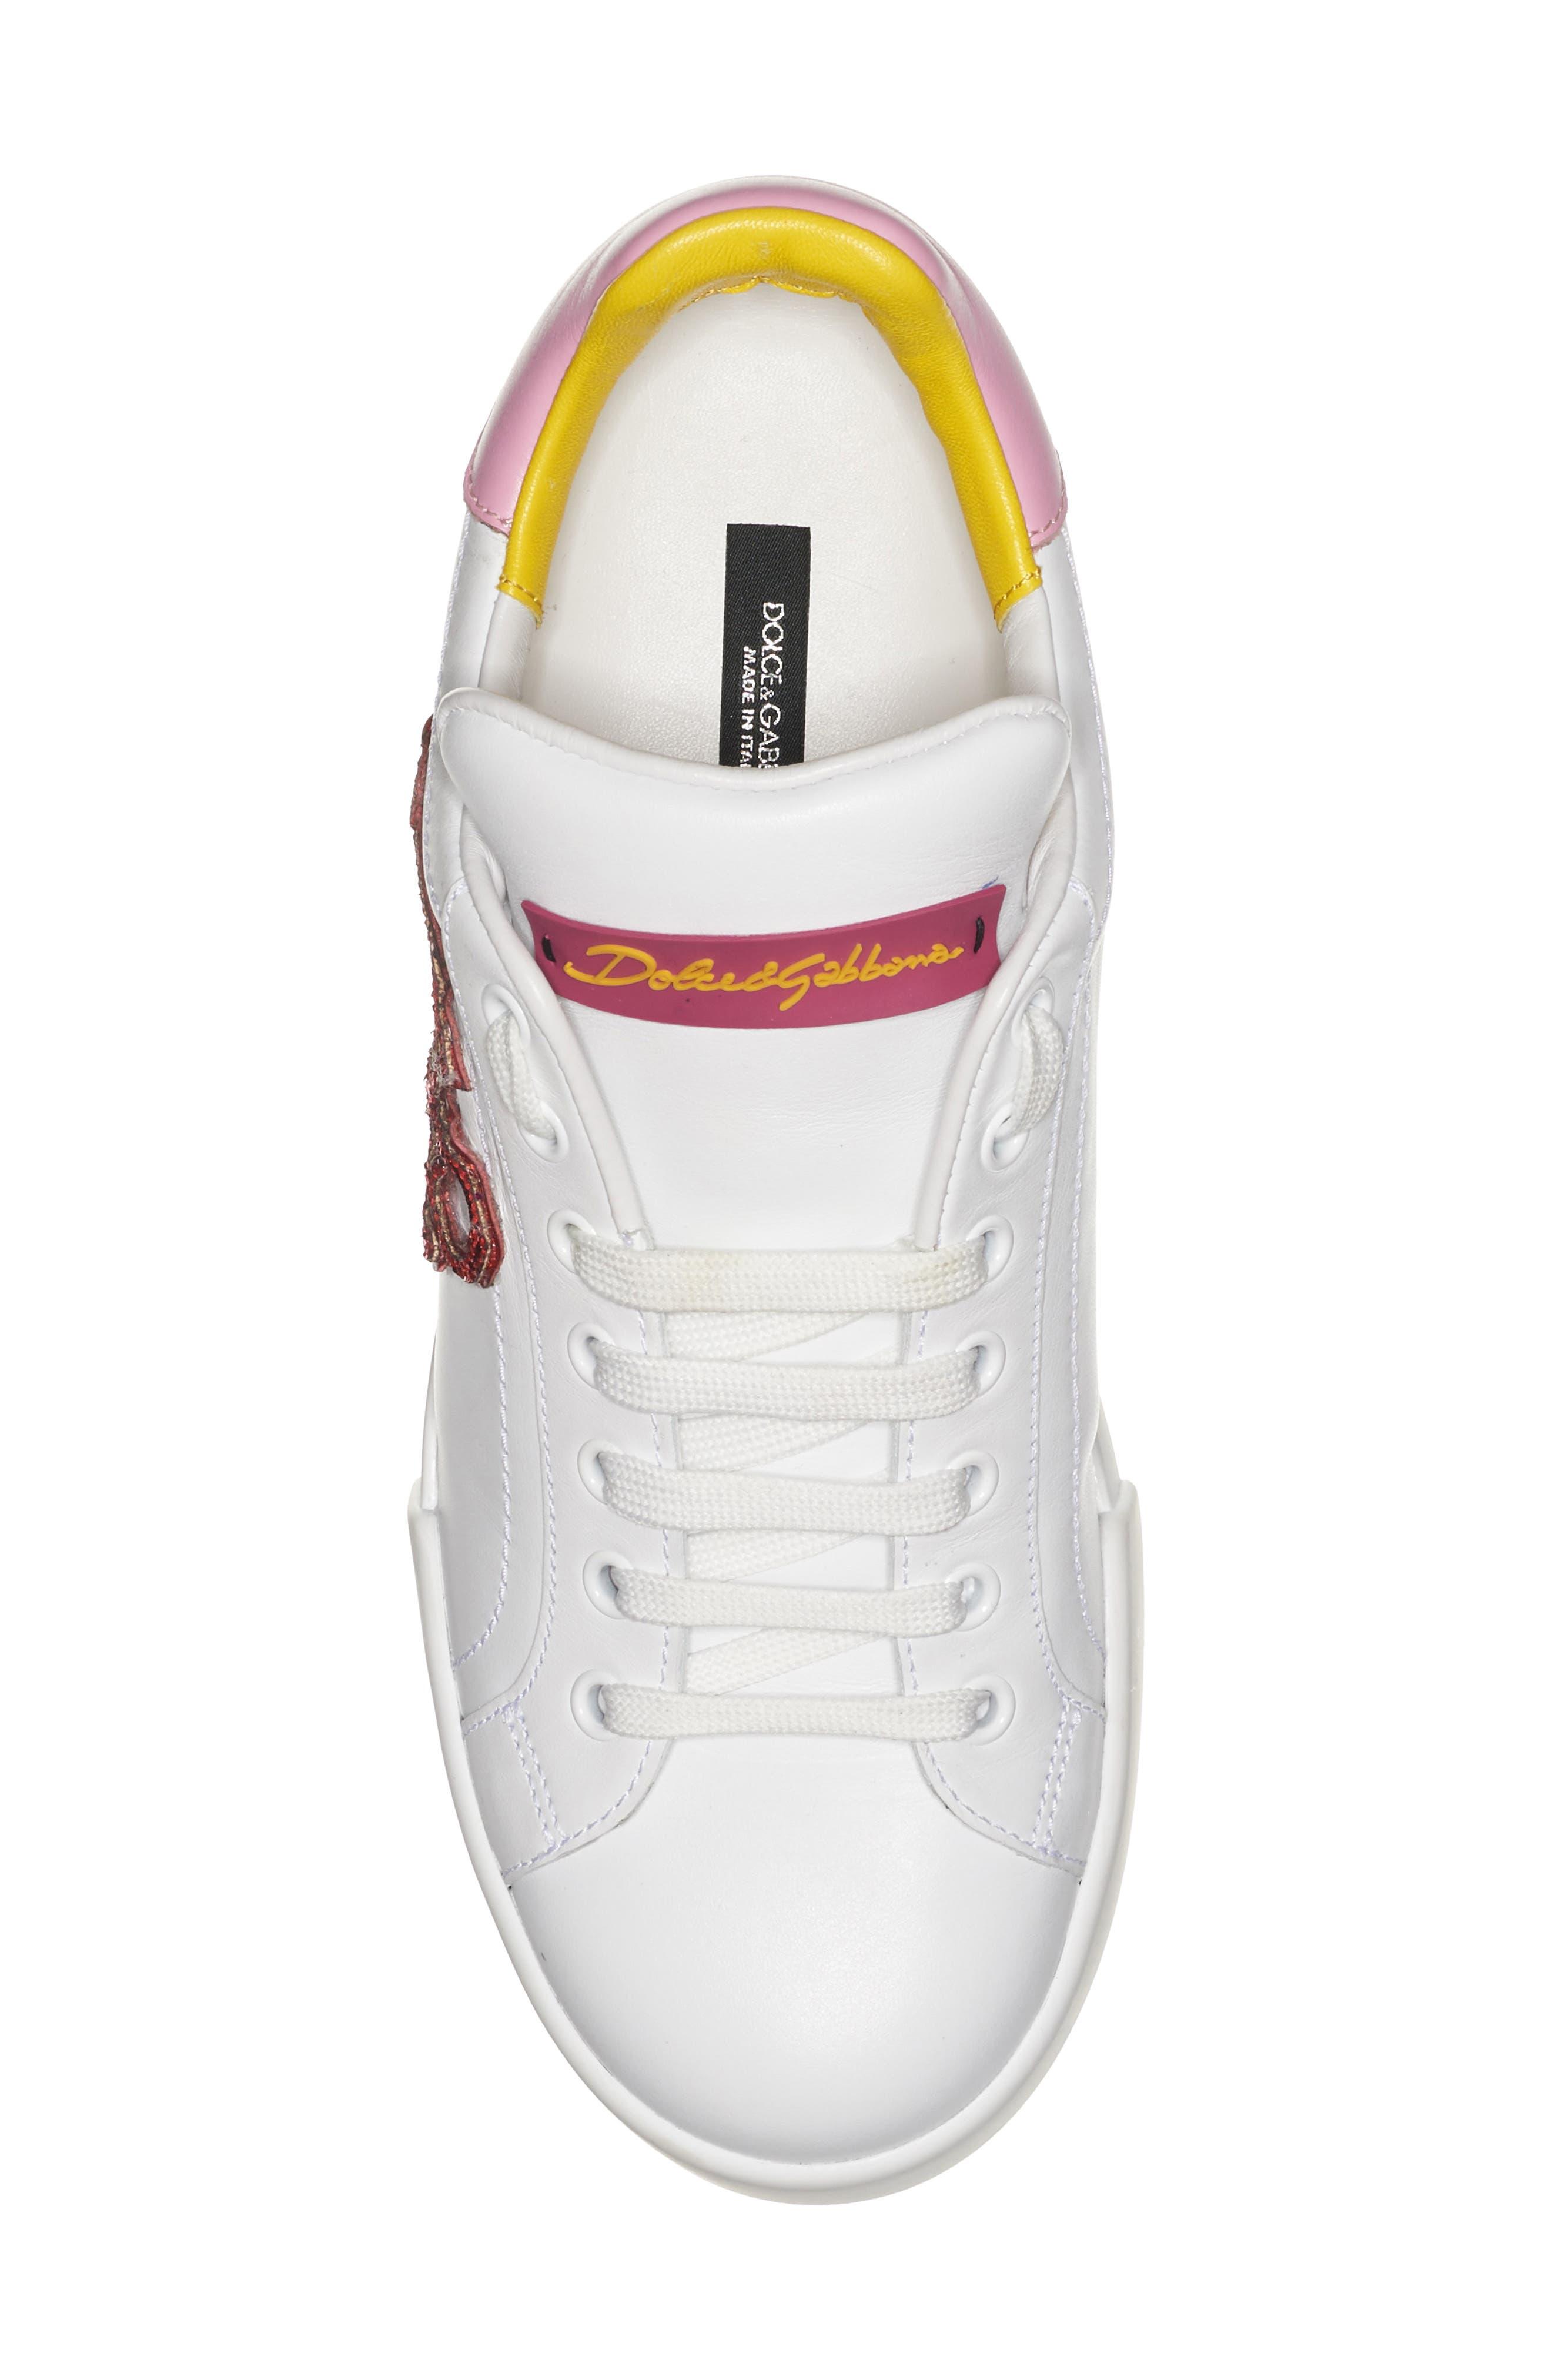 Lipstick Sneaker,                             Alternate thumbnail 4, color,                             White/ Pink